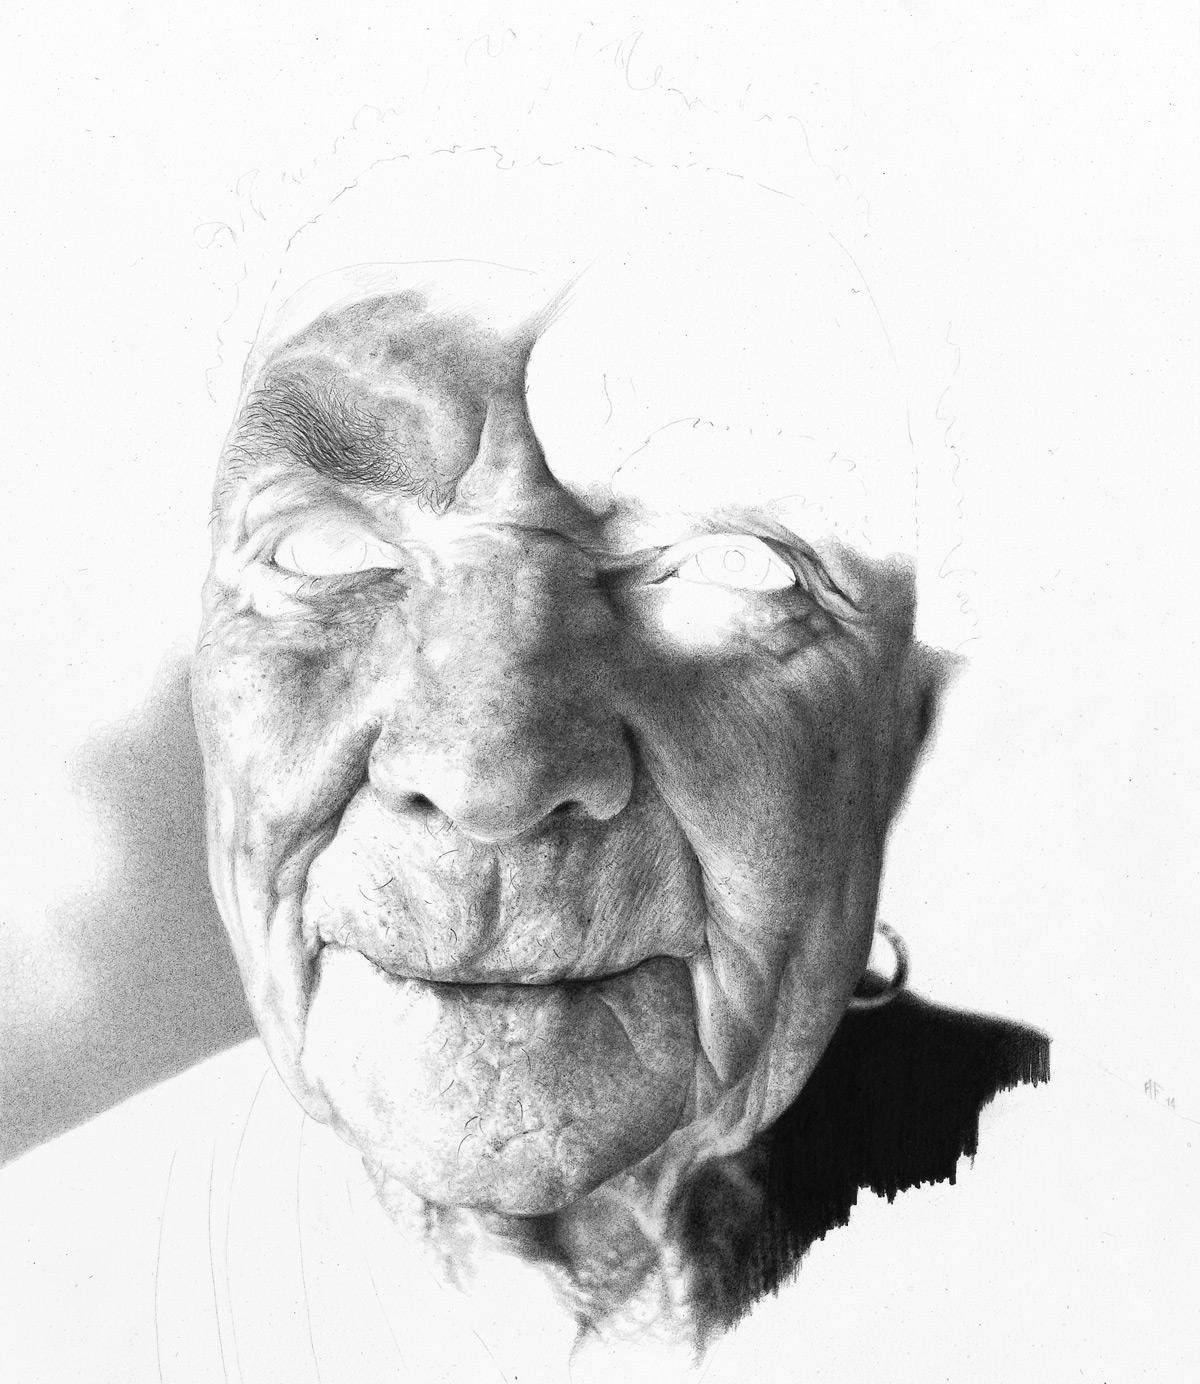 Antonio-Finelli-4-etra-studio-tommasi